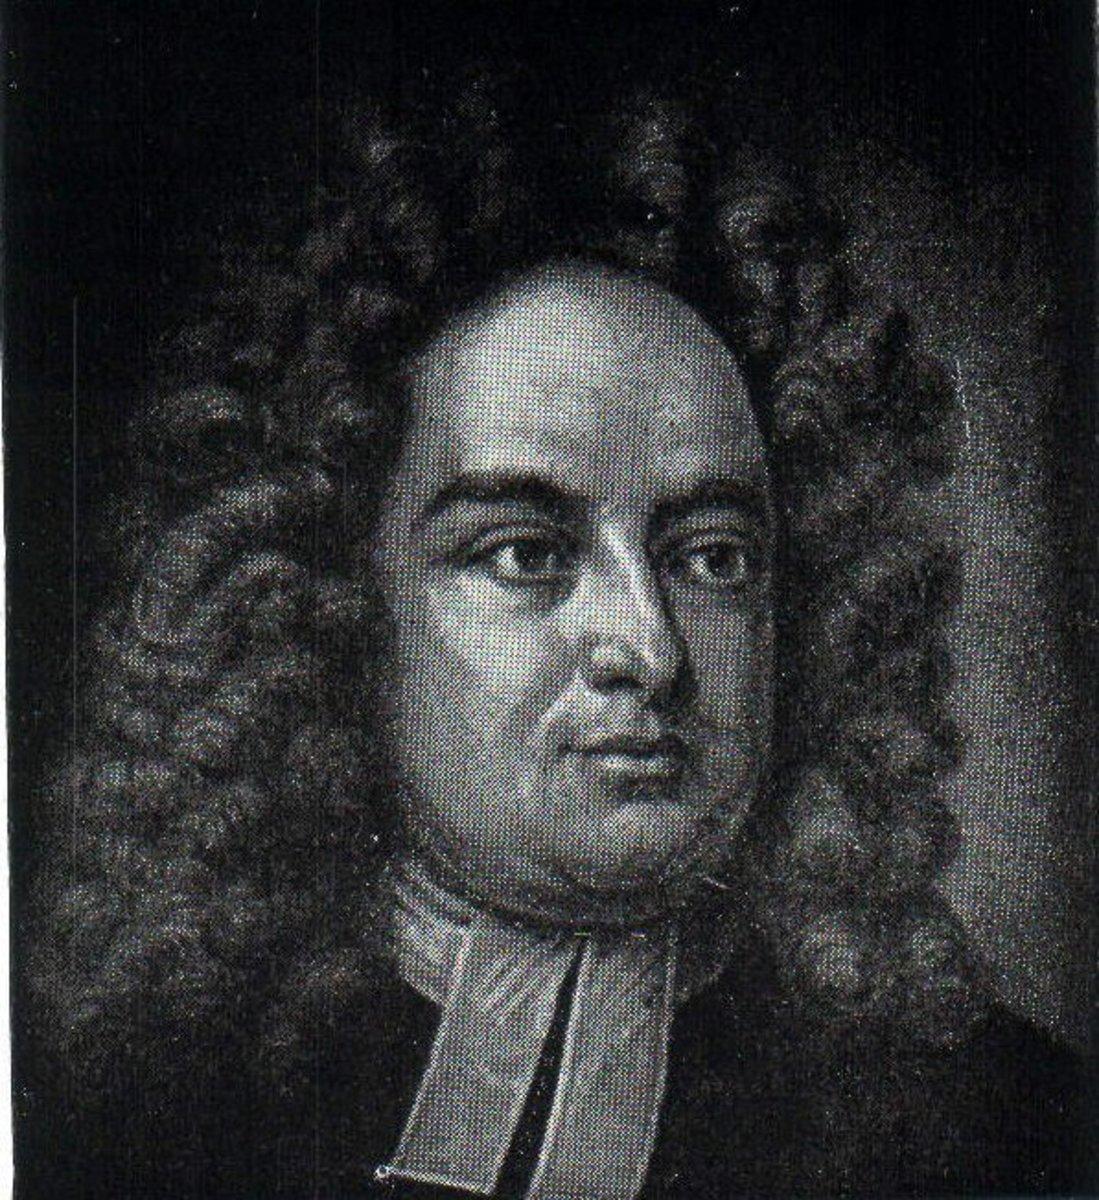 Johnathan Swift